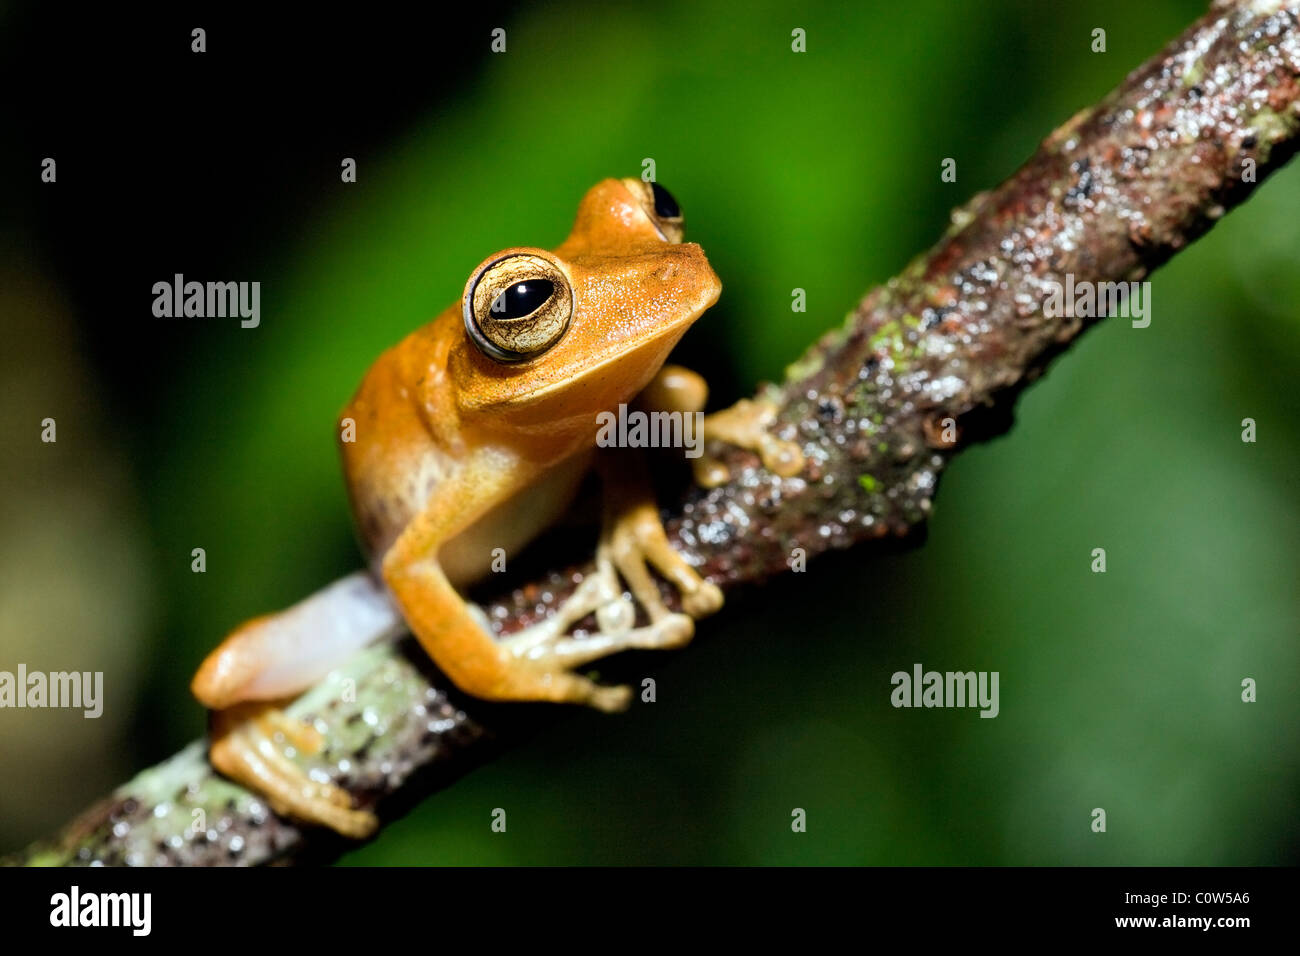 Tree Frog - La Selva Jungle Lodge, Amazon Region, Ecuador - Stock Image